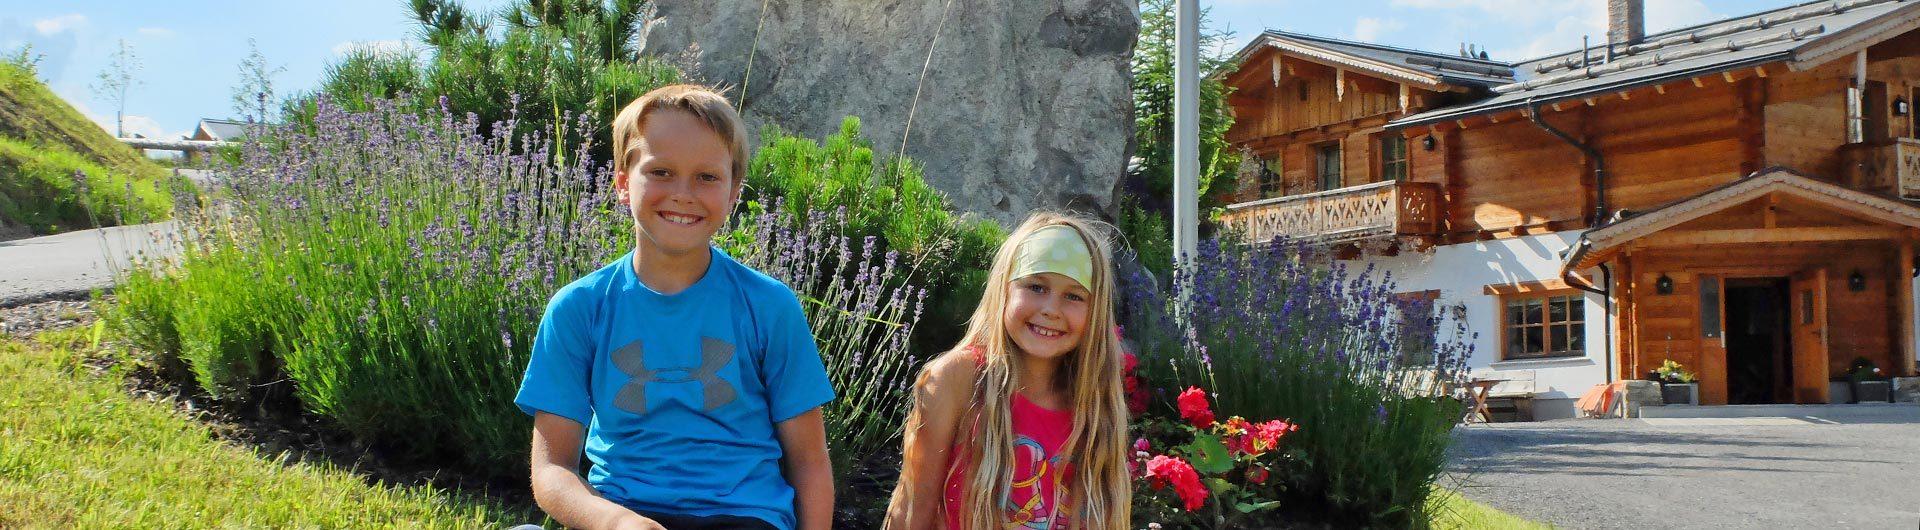 Familienurlaub Reiteralm Alpine Lodge 1